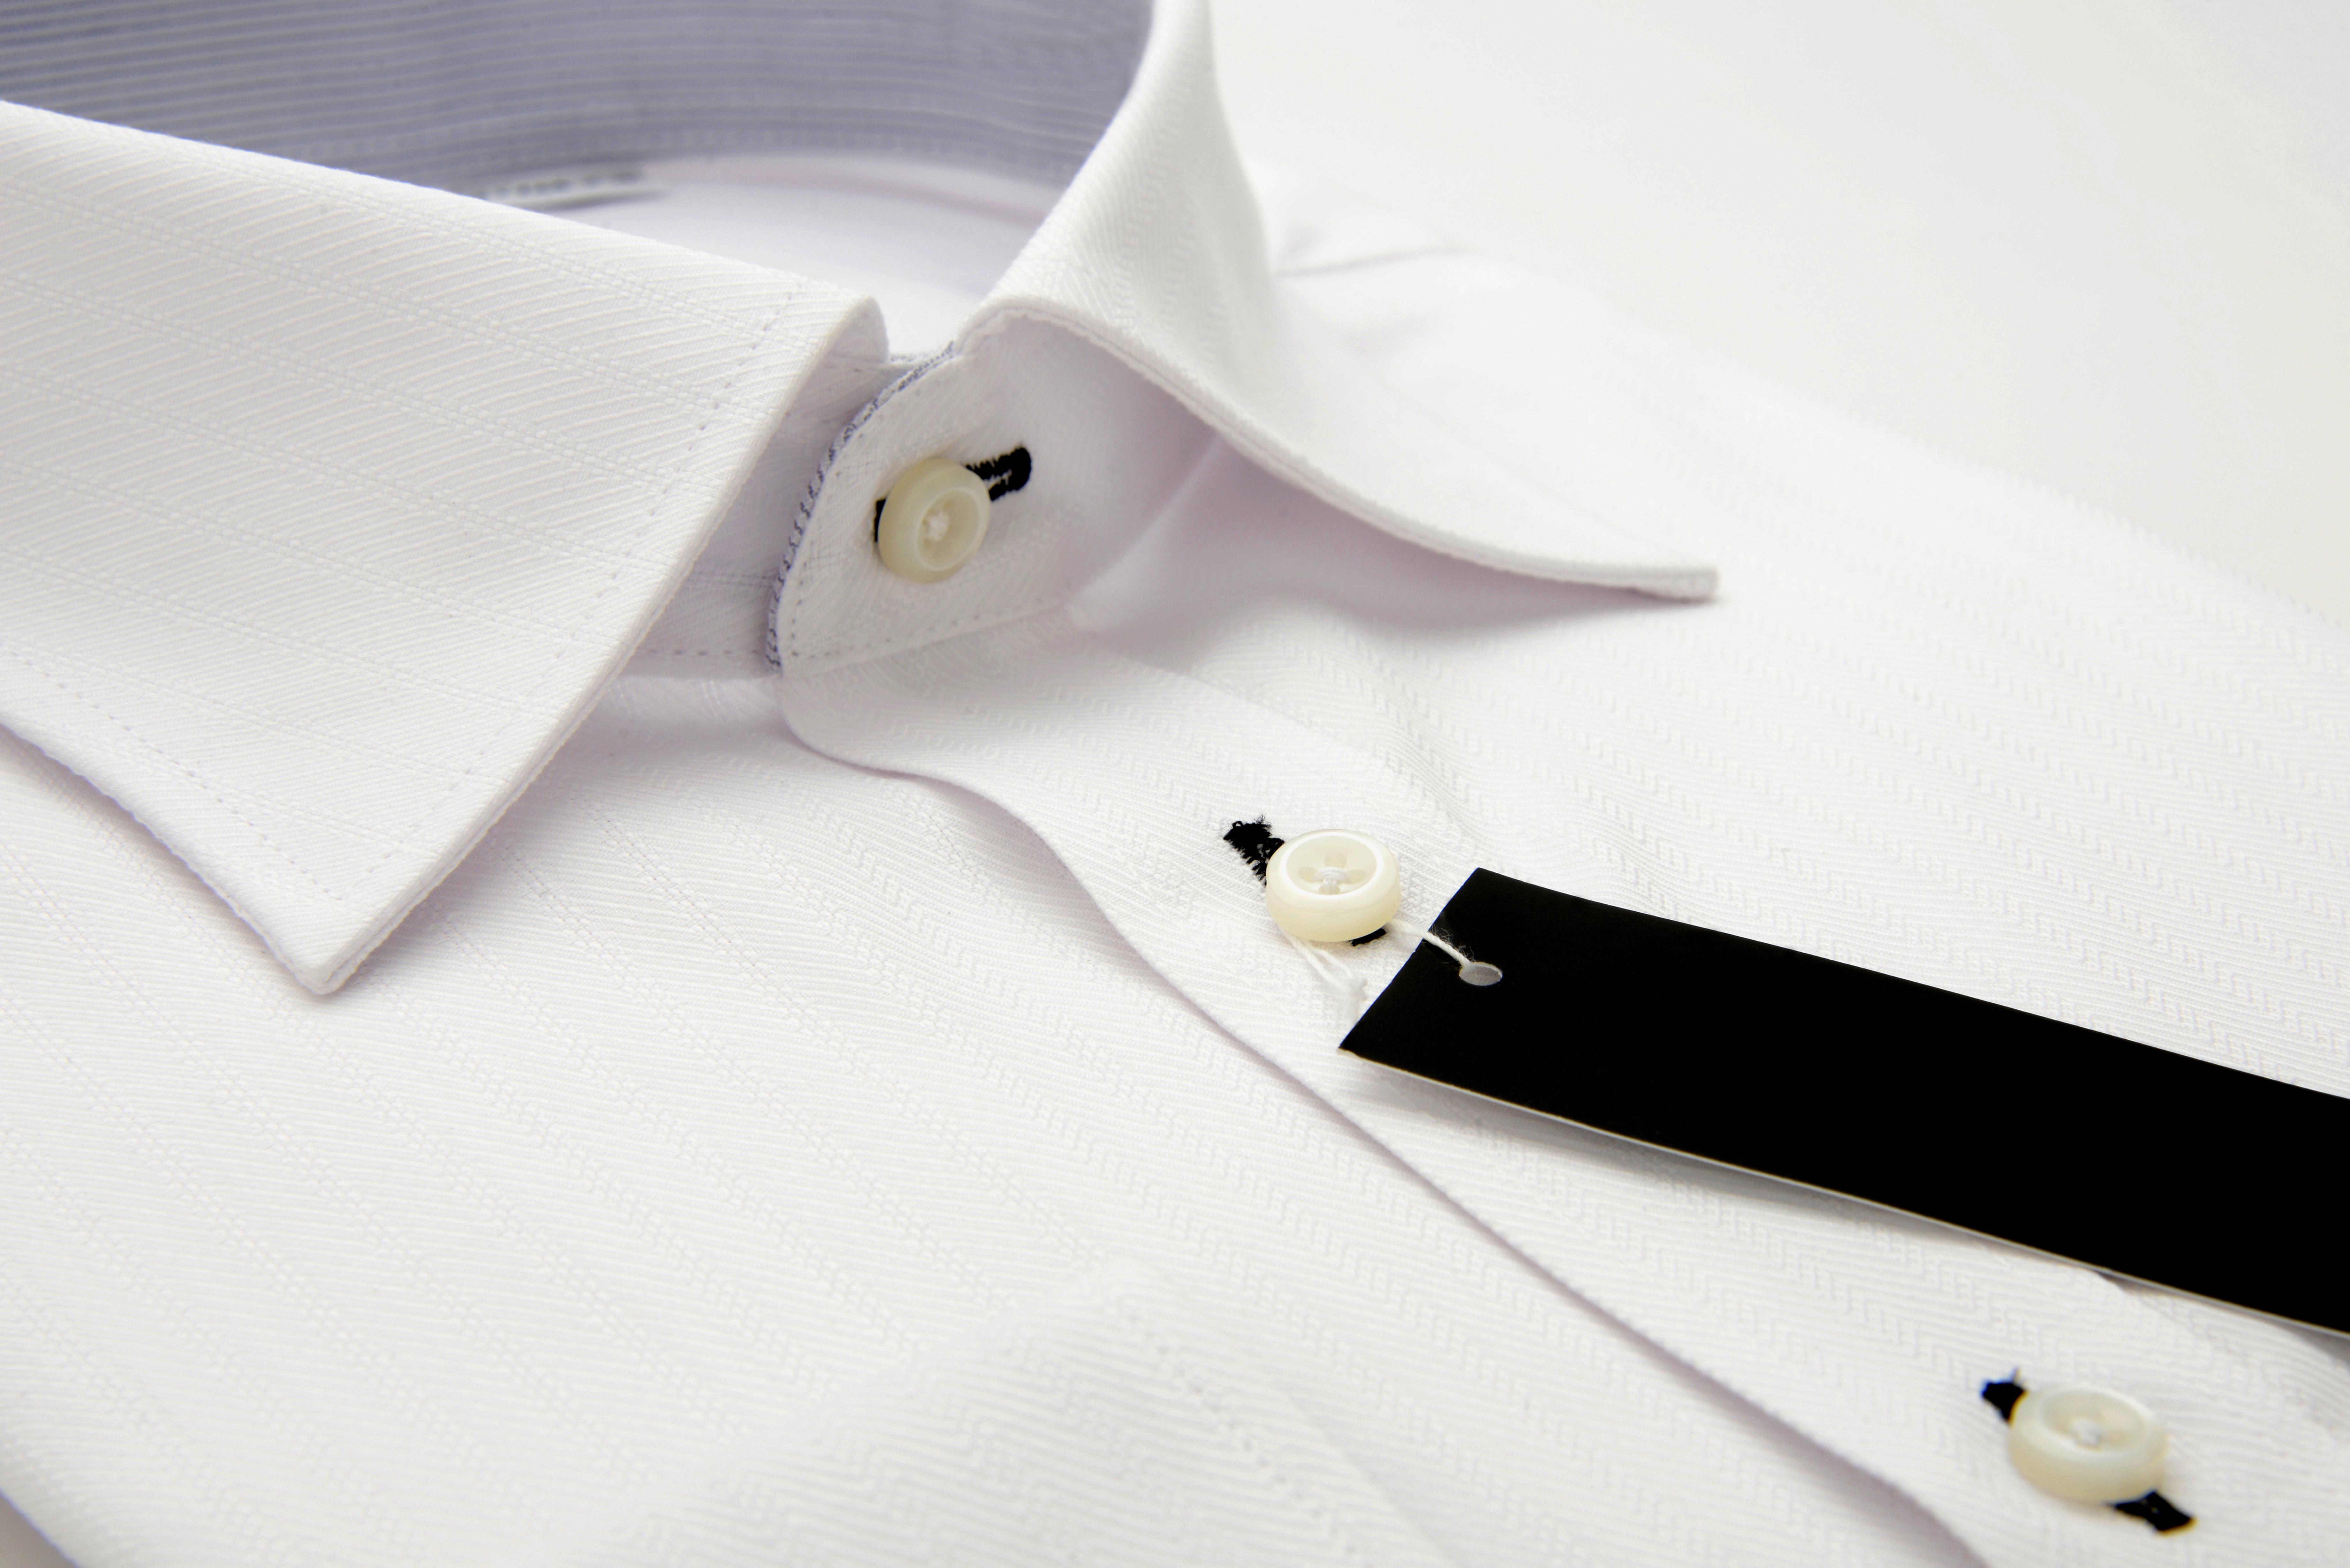 Garment hang tags